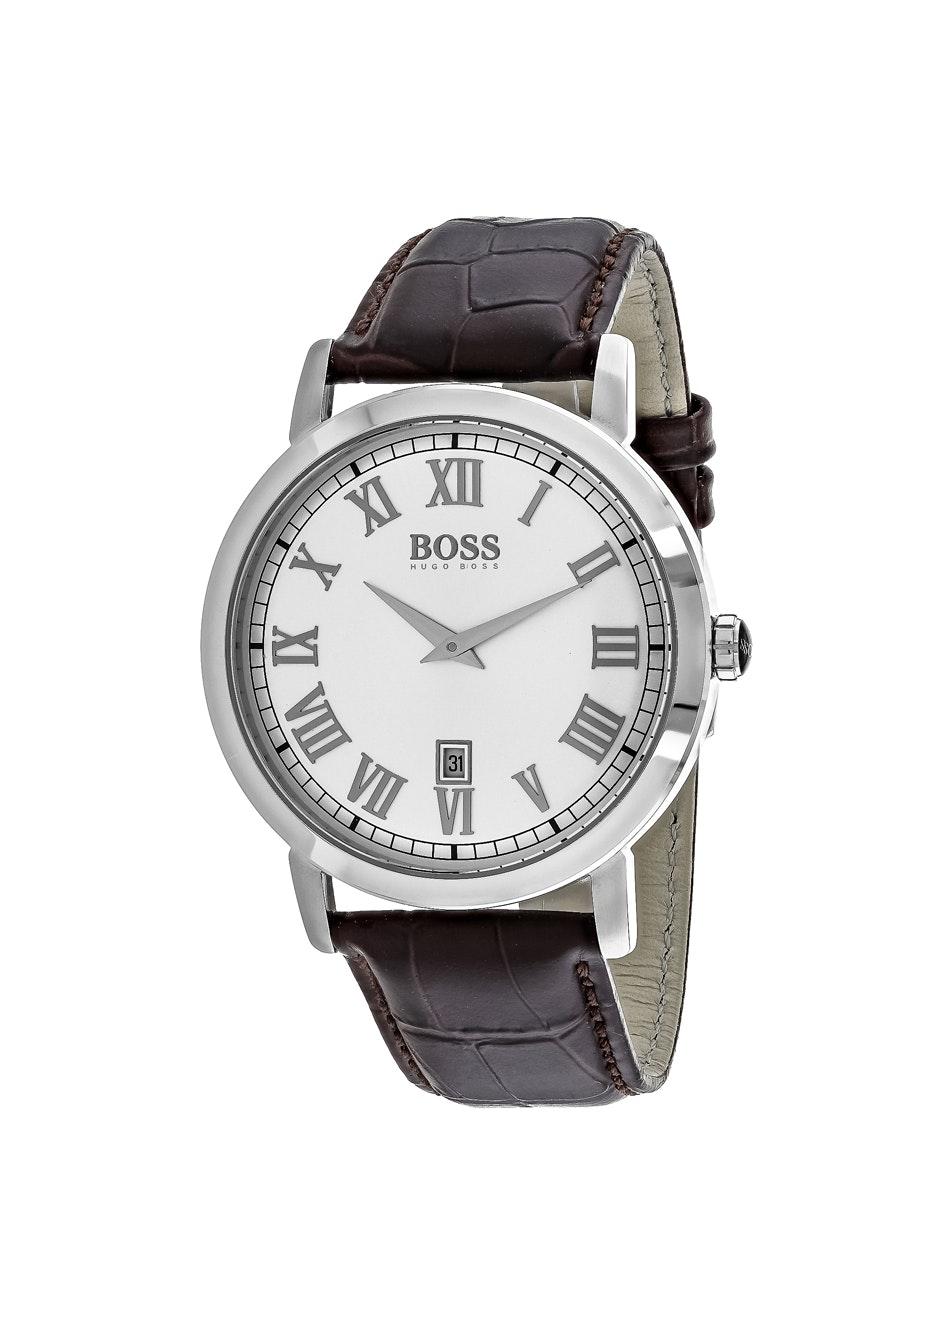 Hugo boss Men's Classic - Silver/Brown